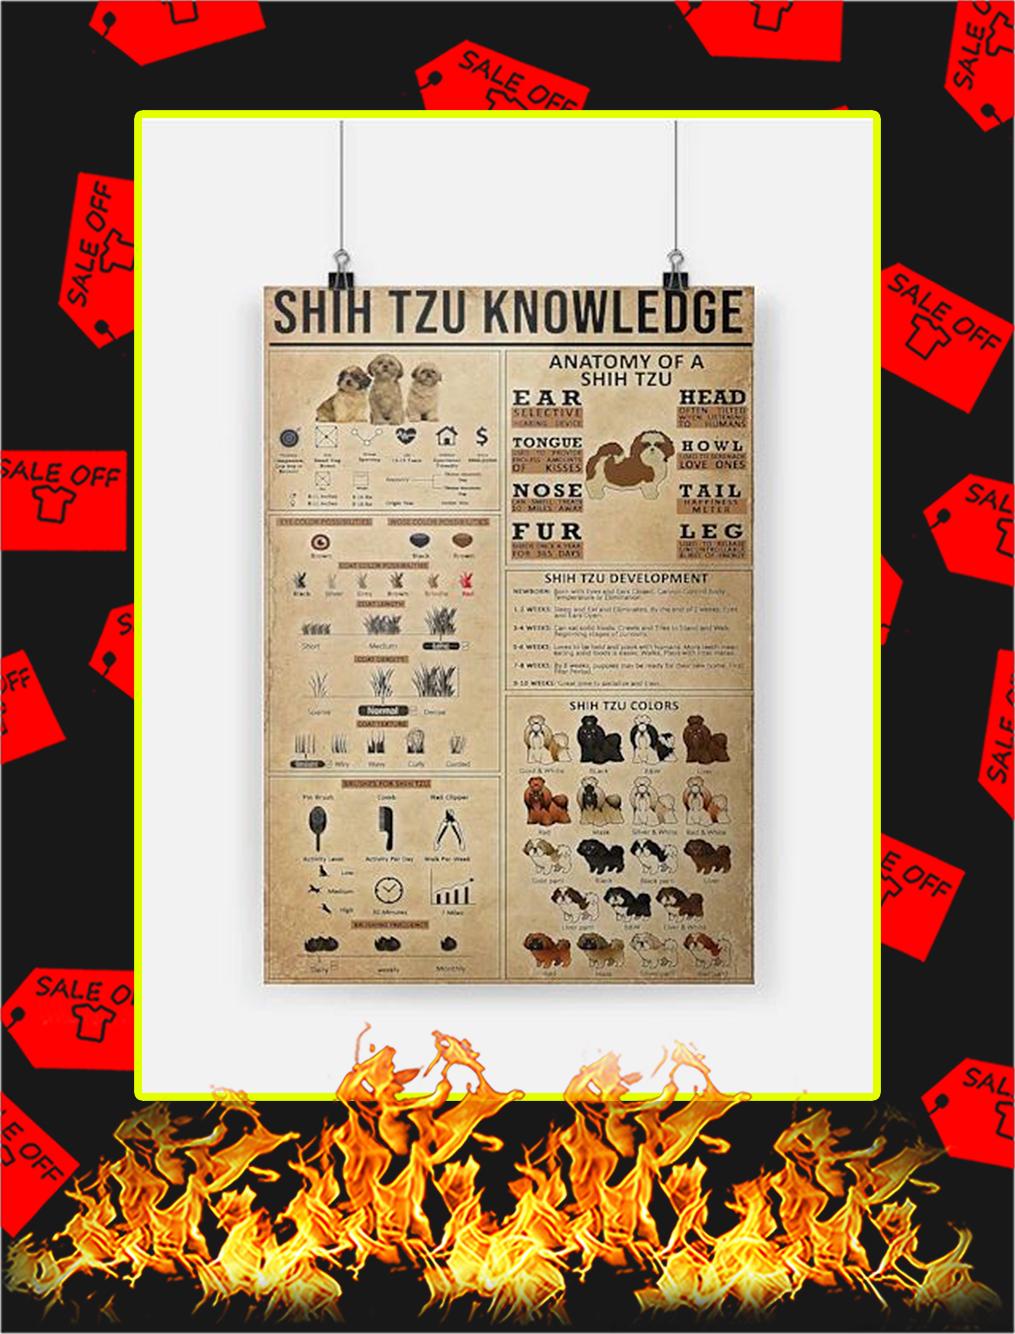 Shih Tzu Knowledge Poster - A4